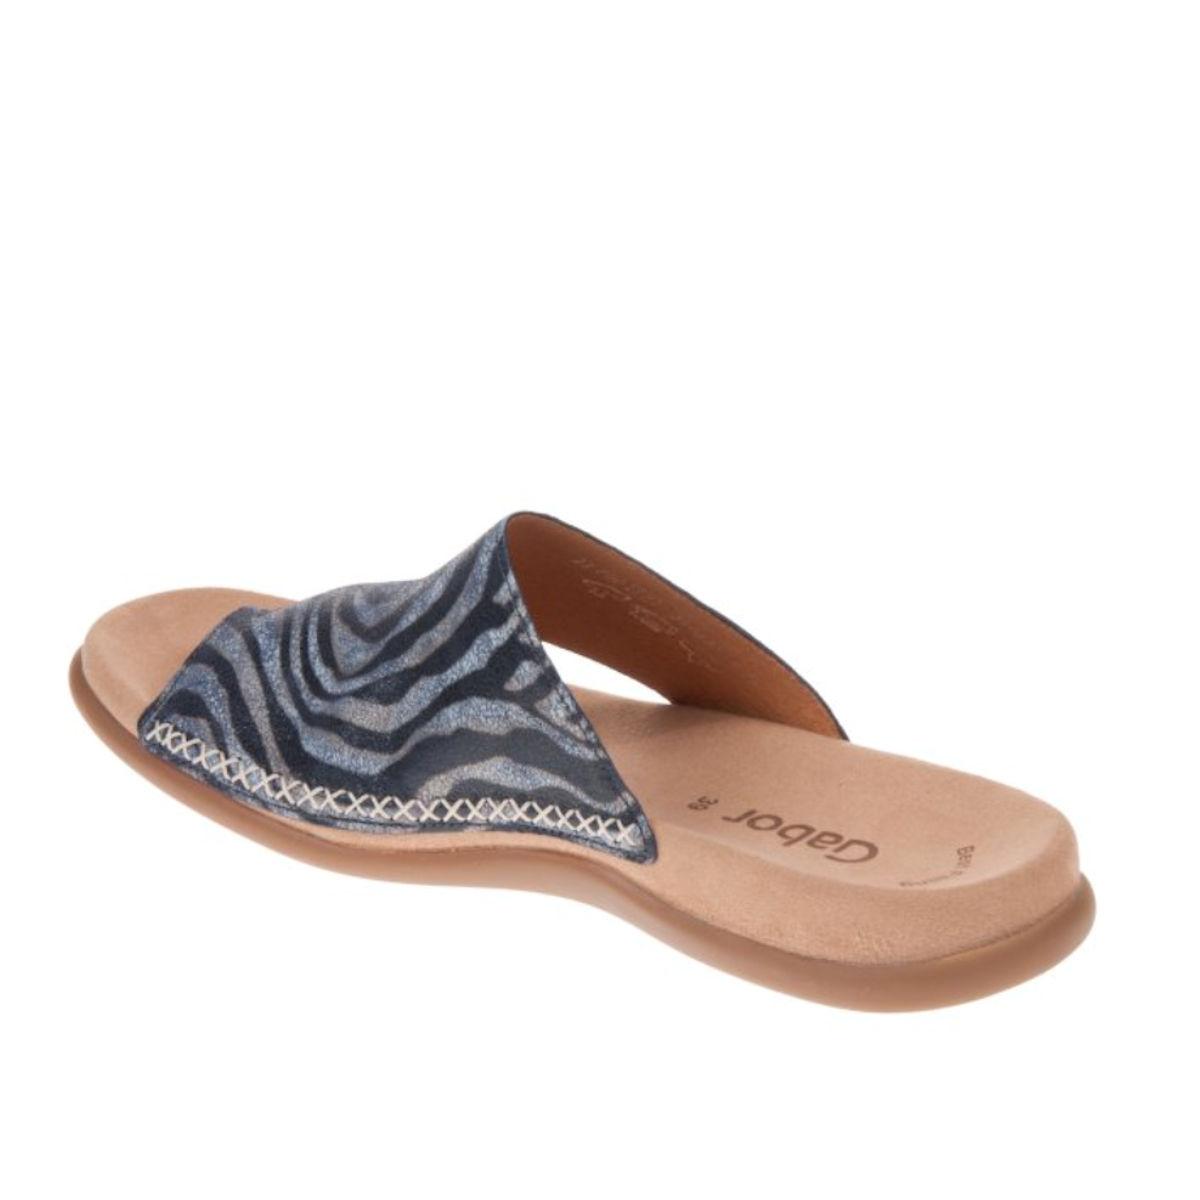 Gabor Lanzarote - Safari Bluette Toe Ring Mule